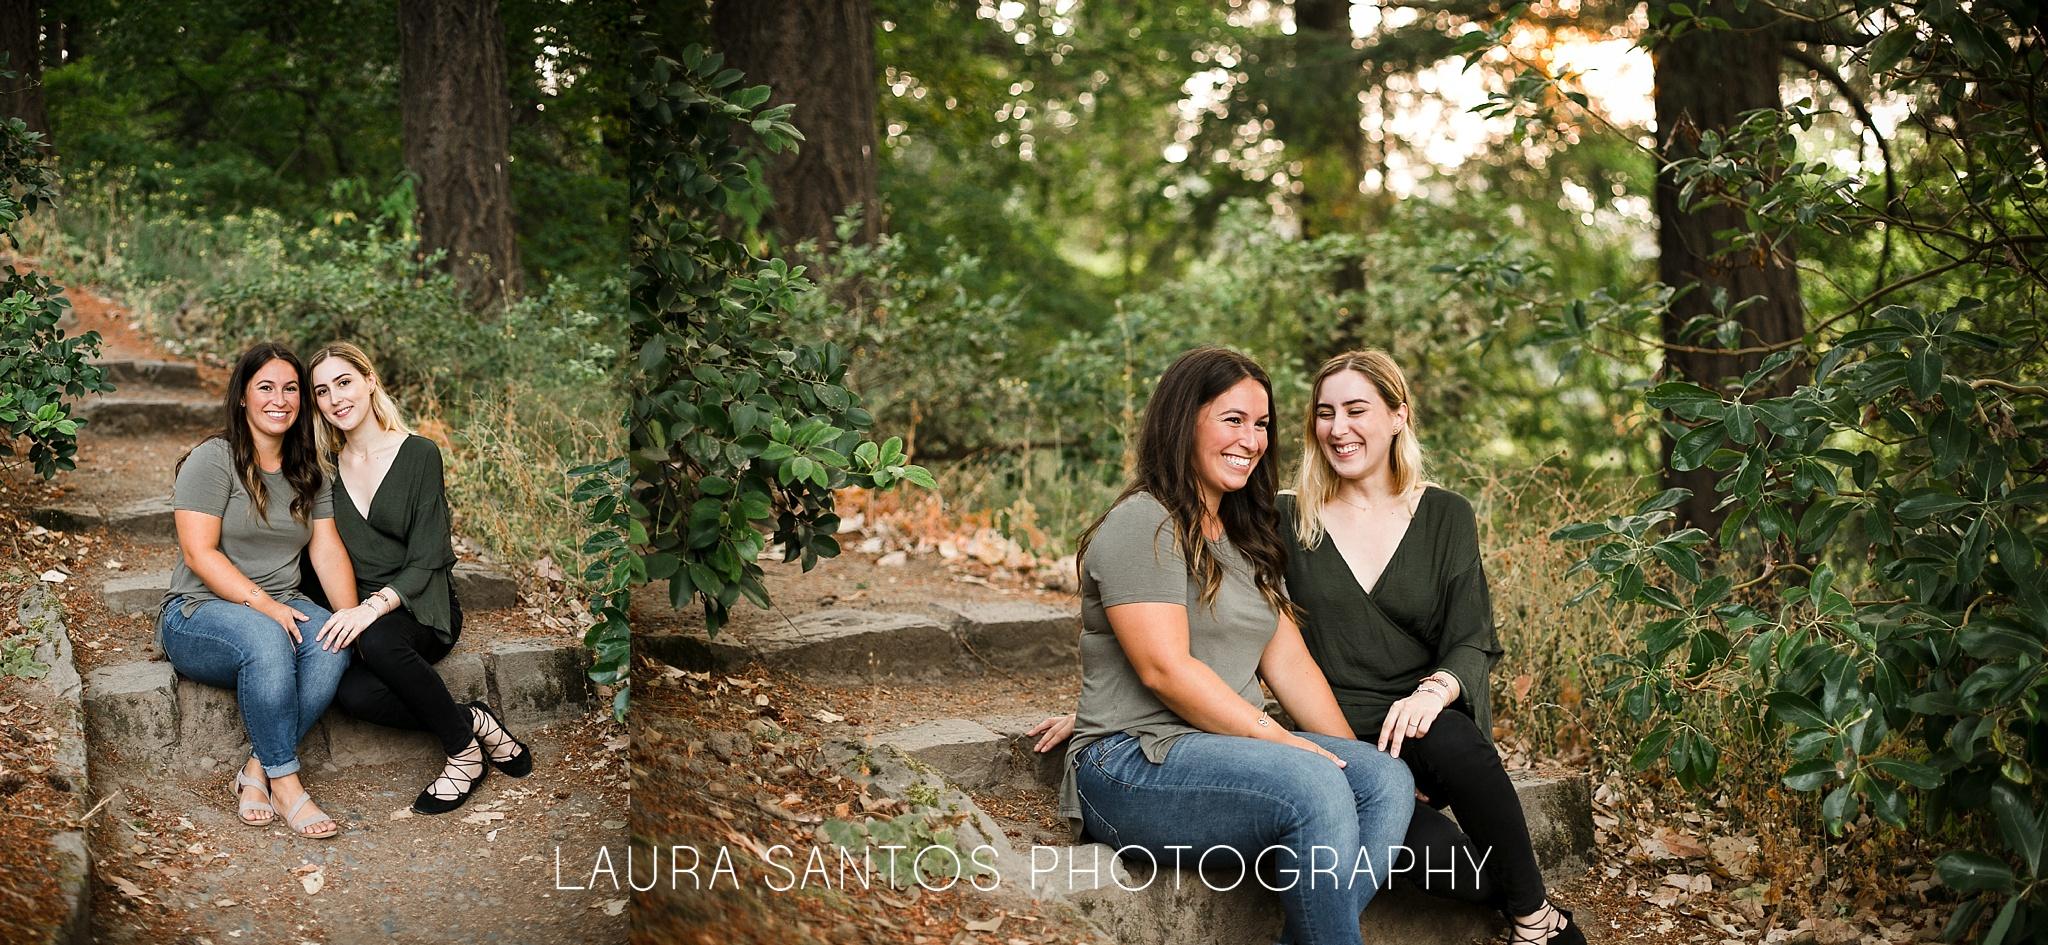 Laura Santos Photography Portland Oregon Family Photographer_0150.jpg